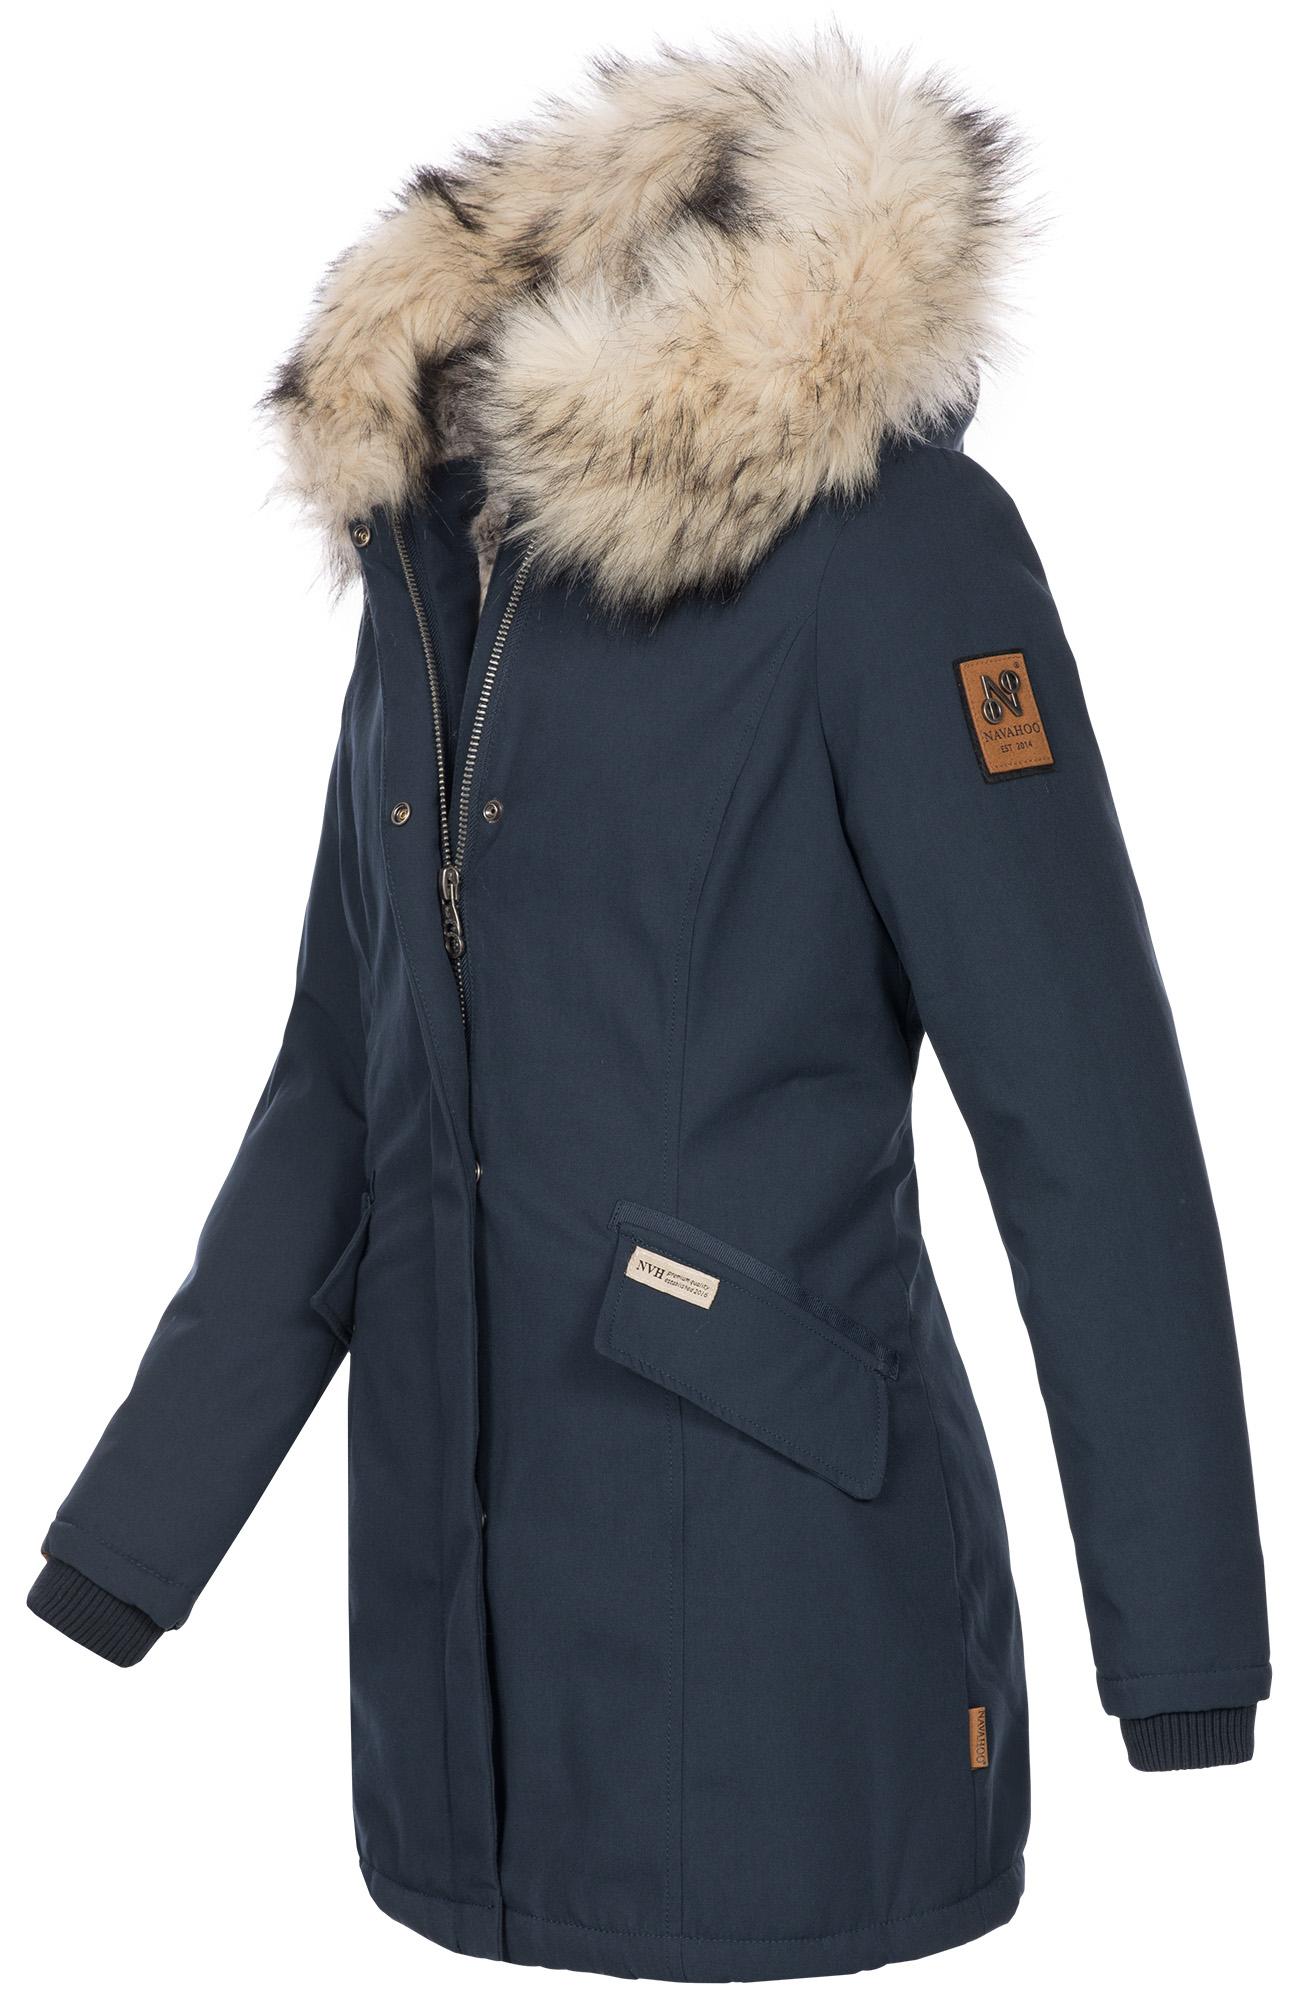 Navahoo-Premium-Damen-Winter-Jacke-Parka-Mantel-Winterjacke-warm-Kunstfell-B669 Indexbild 9